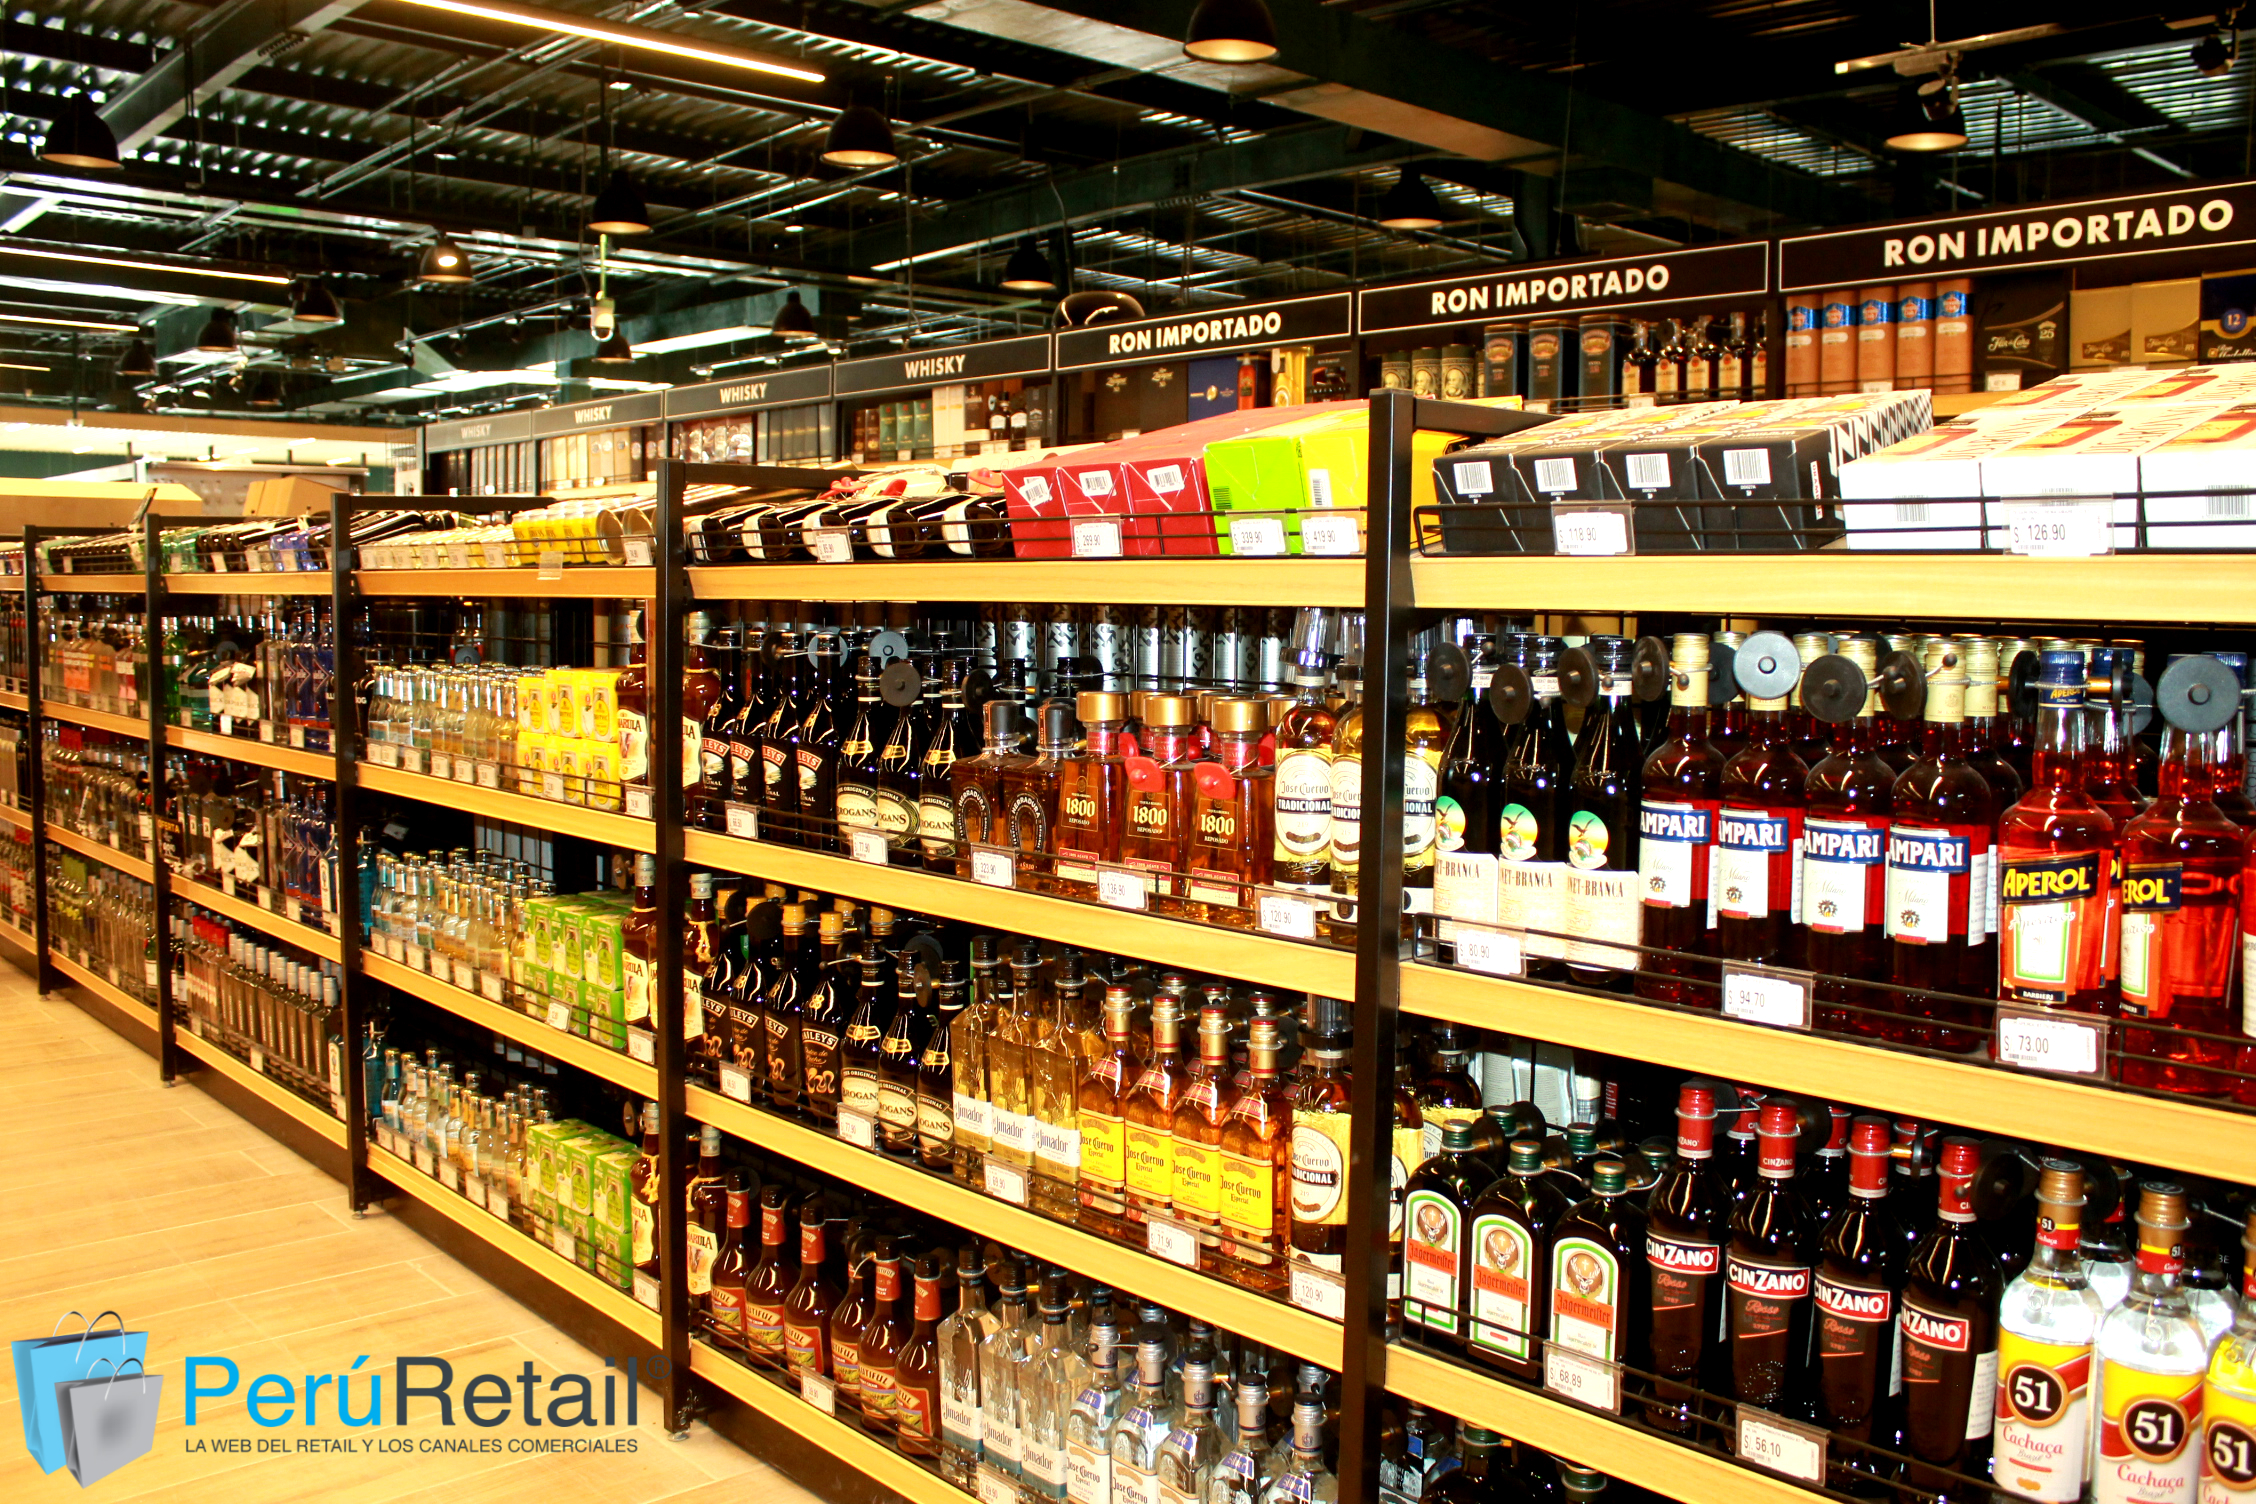 Vivanda Asia 1 Peru Retail - Sector licores crecería 10% en Perú este 2018